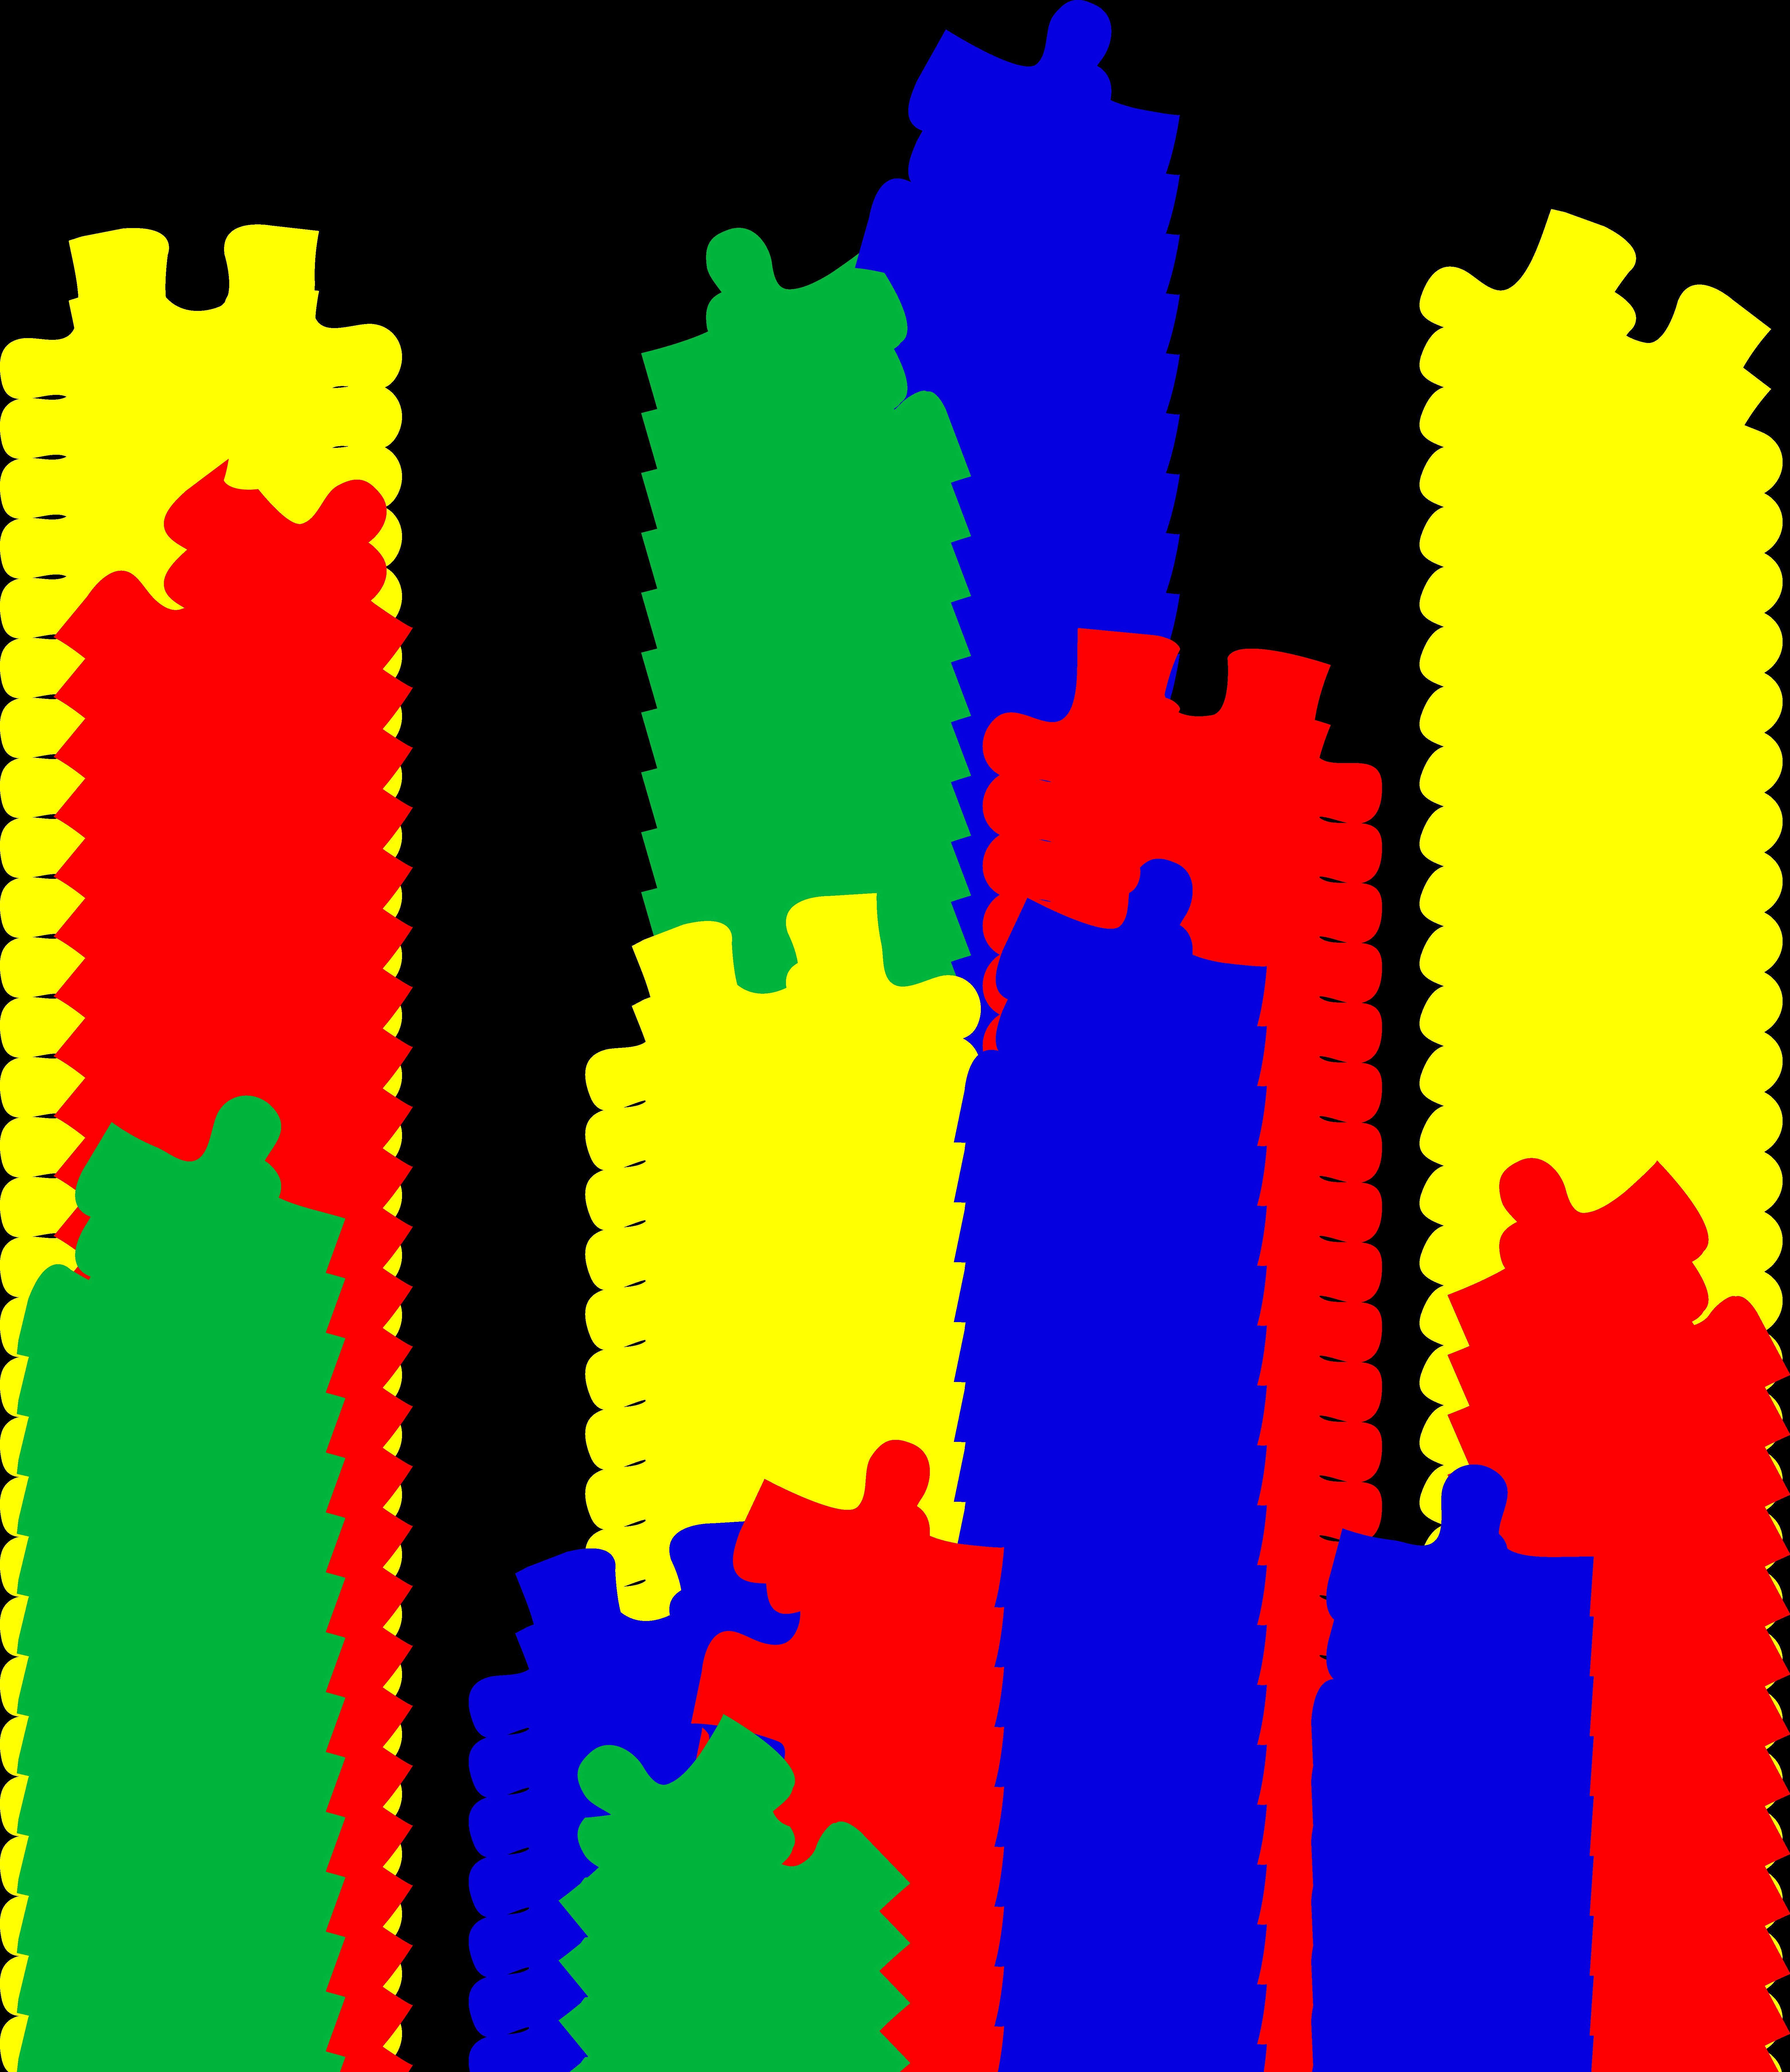 childrens puzzle pieces scattered clip art sweet clip art rh m sweetclipart com puzzle clip art for powerpoint slides puzzle clip art images